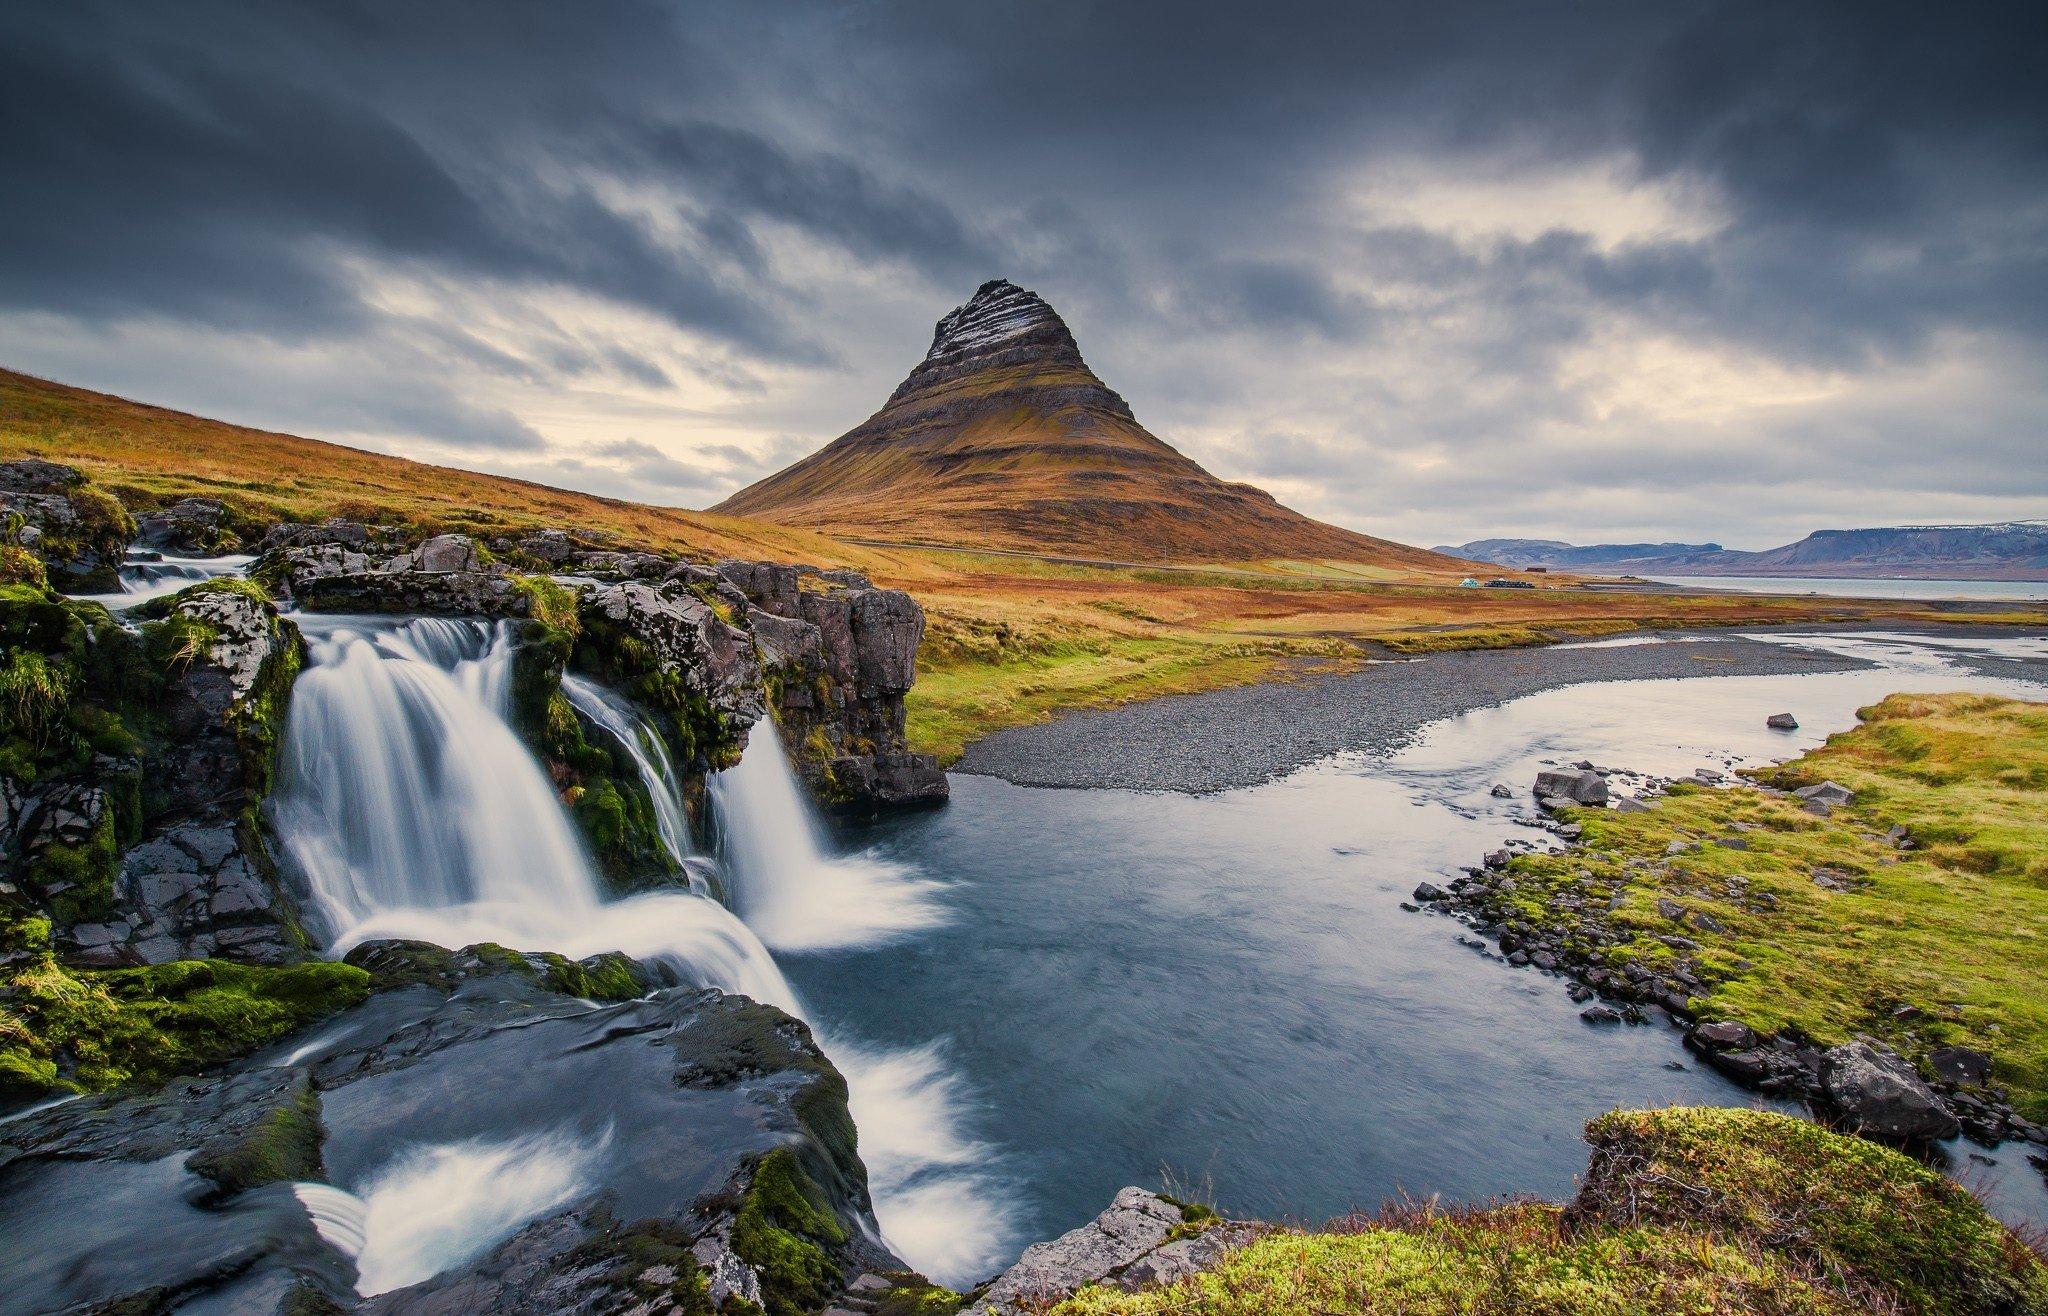 Mountain Kirkjufell Iceland waterfall wallpaper 2048x1316 282209 2048x1316